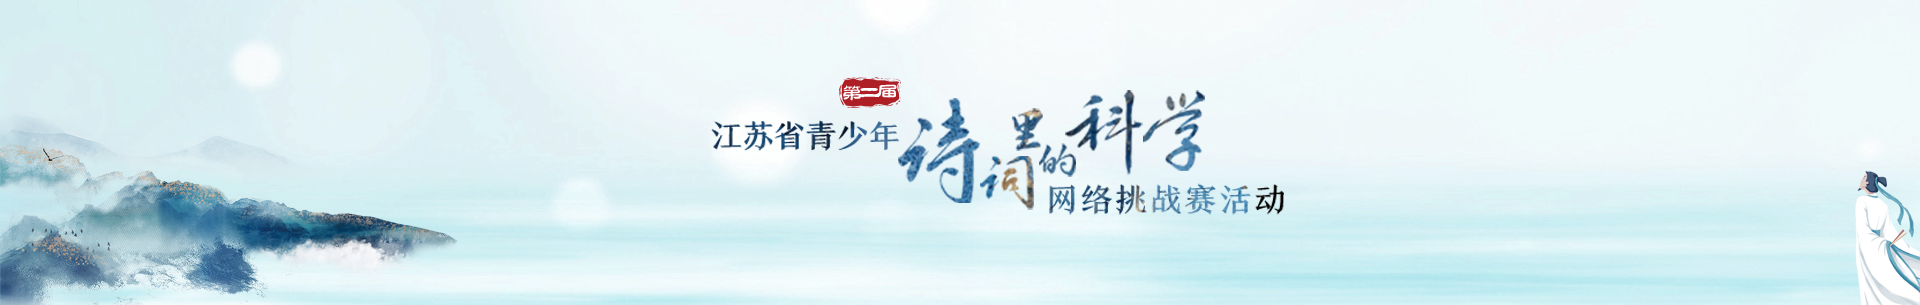 banner(1)